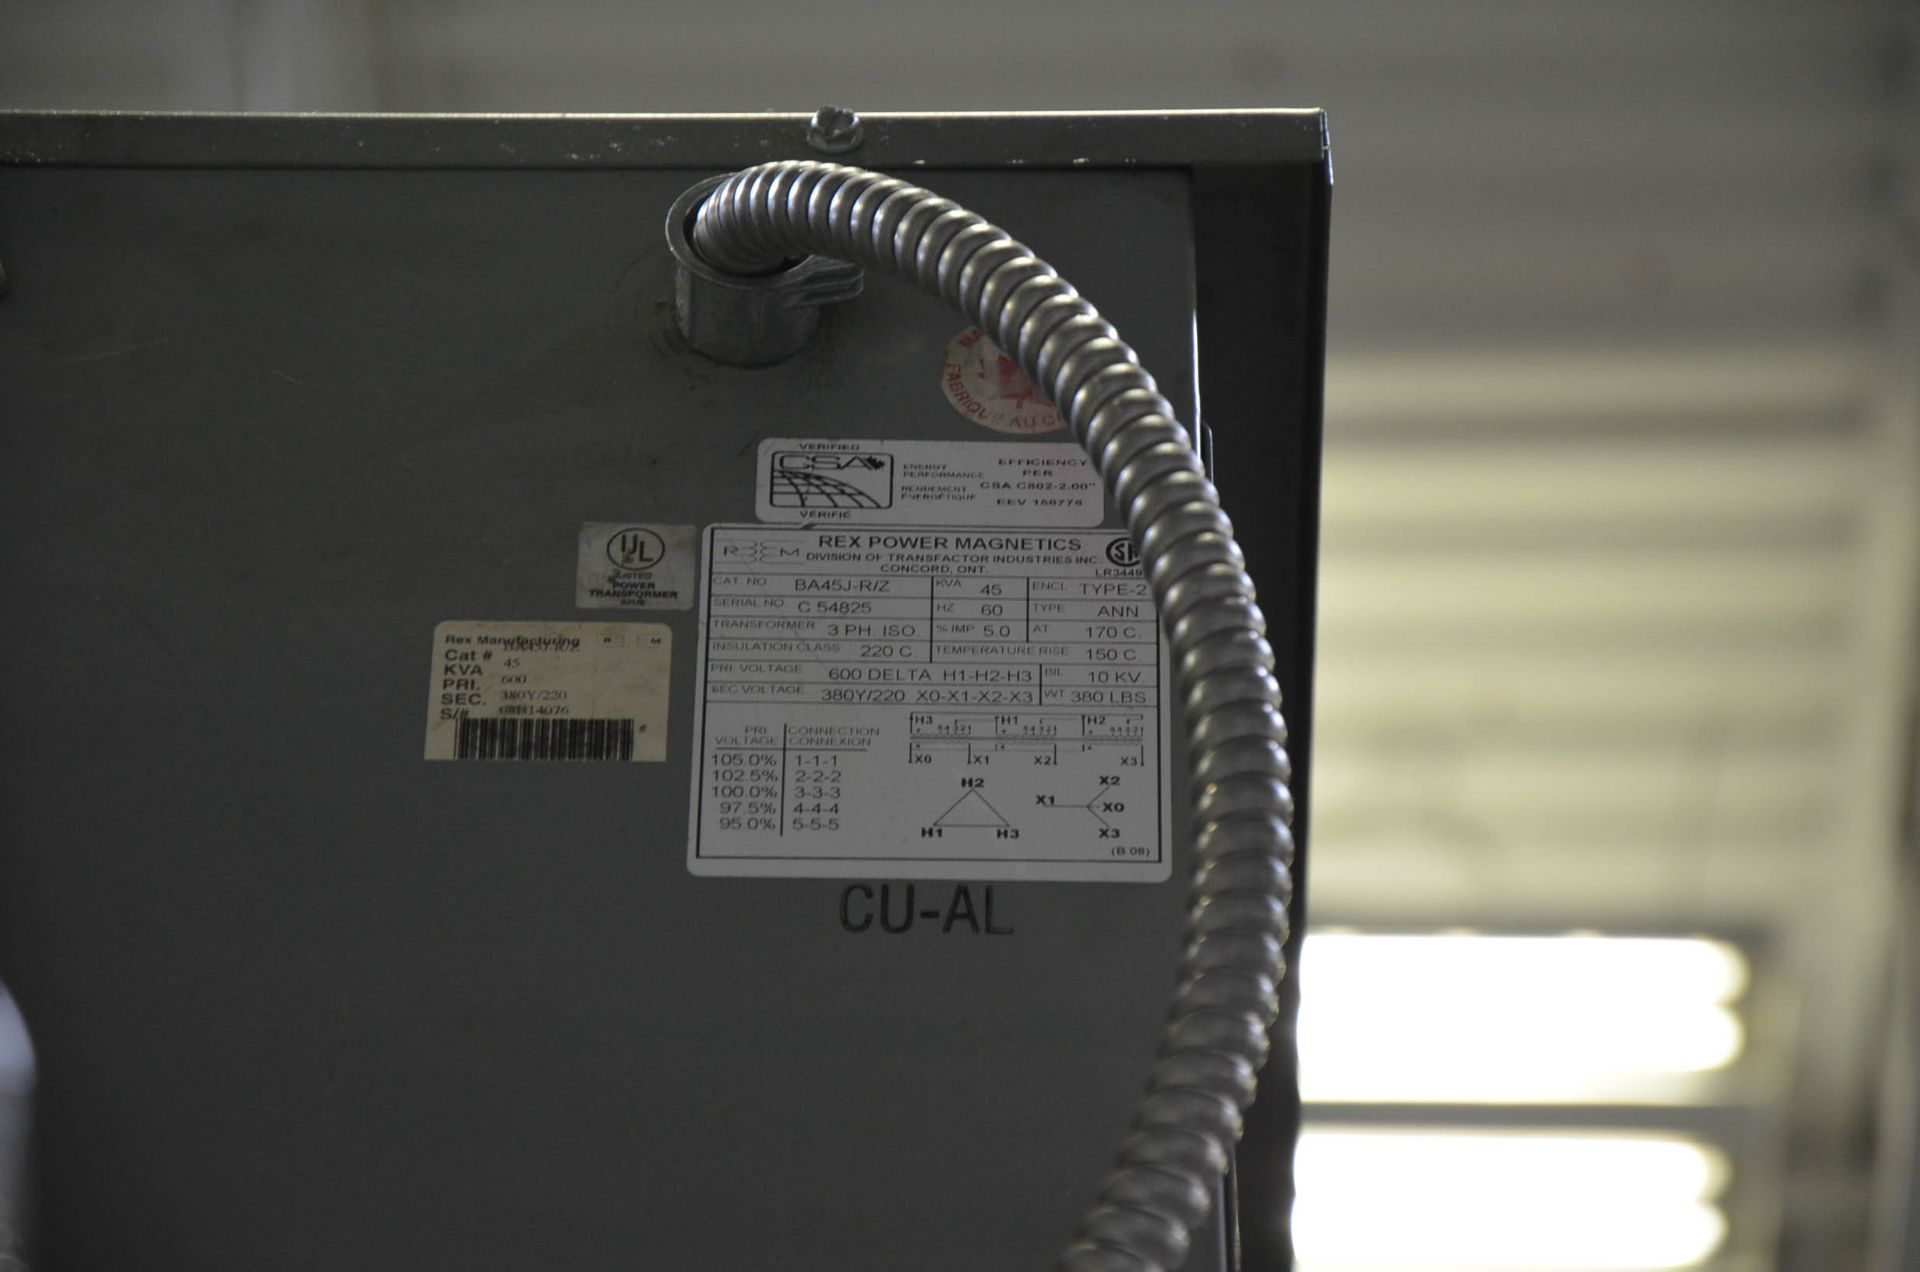 REX 45KVA/600-380-220V/3PH/60HZ TRANSFORMER (CI) [RIGGING FEES FOR LOT #205 - $50 USD PLUS - Image 2 of 2